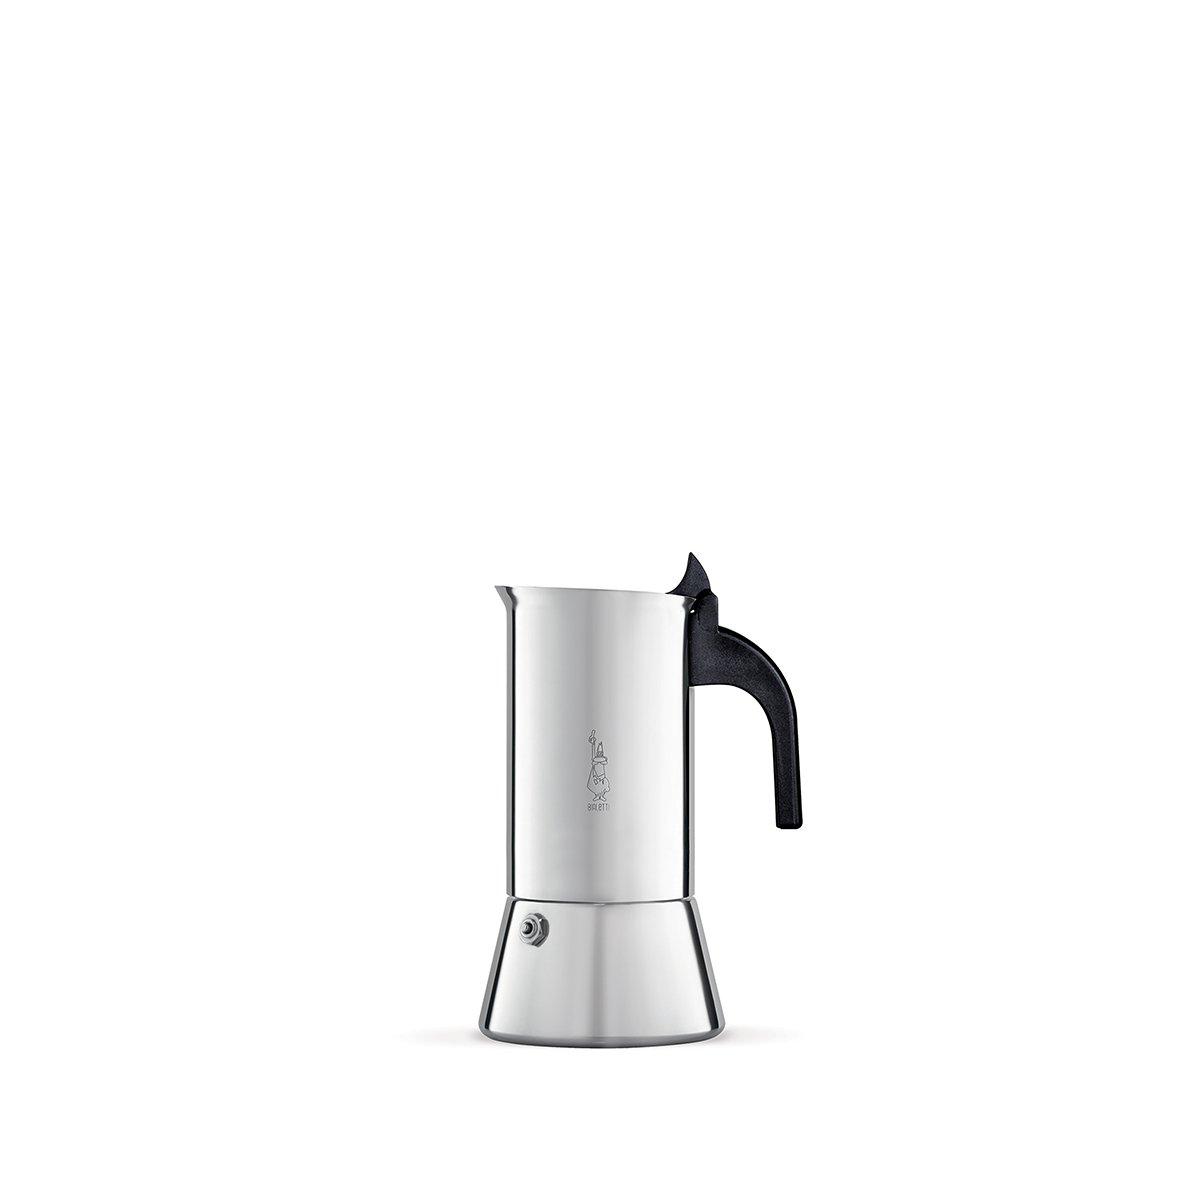 Bialetti Venus 2 (Italian Espresso Size Cups) Stainless Steel Espresso Maker 1698 hirota-9403433-1